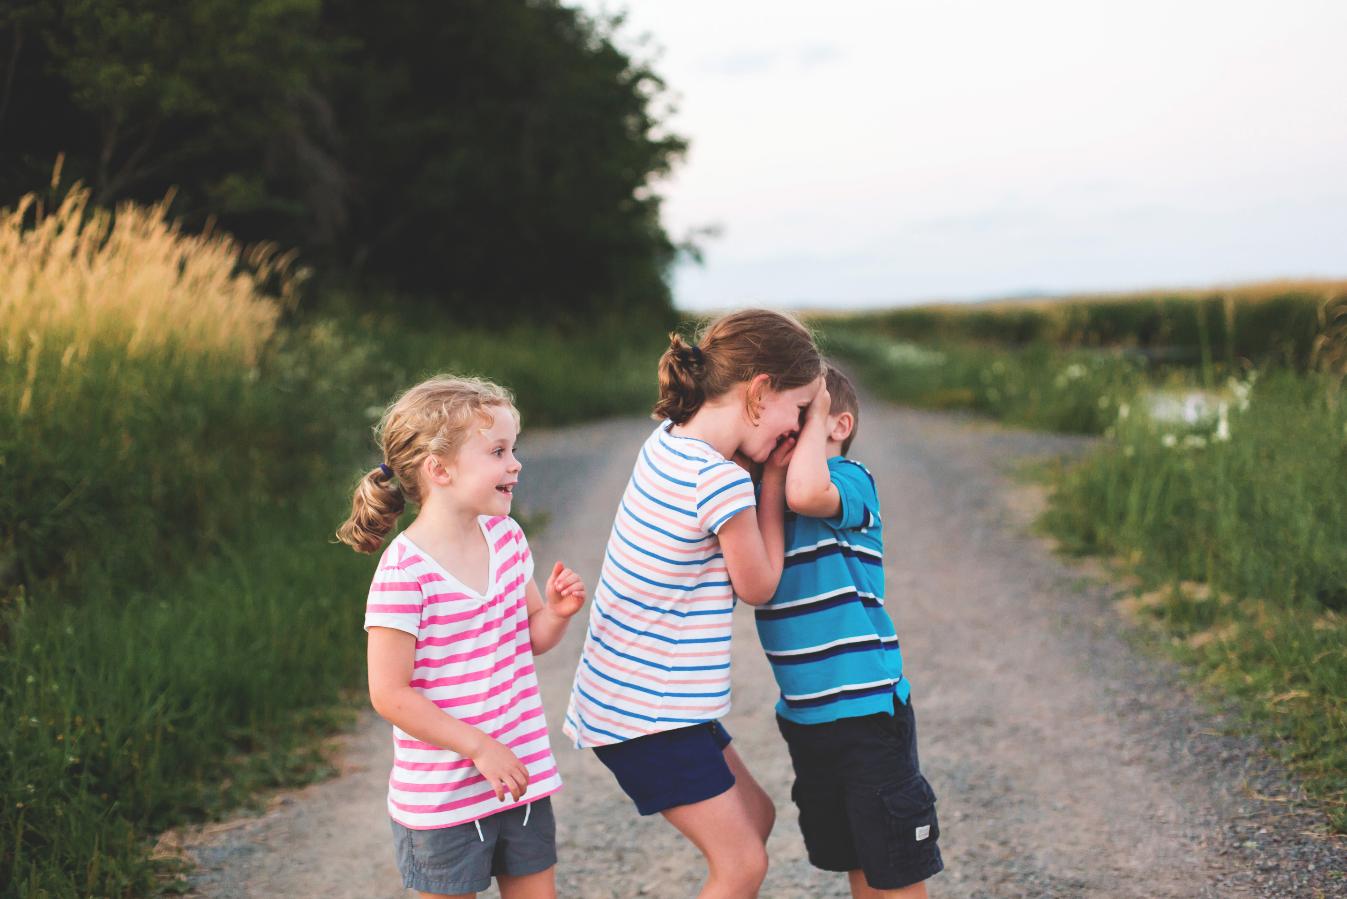 Hamilton-Toronto-Burlington-Oakville-welland-Niagara-Cambridge-Dundas-Ontario-Family-photographer-photography-Moments-by-Lauren-Nova-Scotia-Antigonish-Lifestyle-Session-Image-Photo-21.png